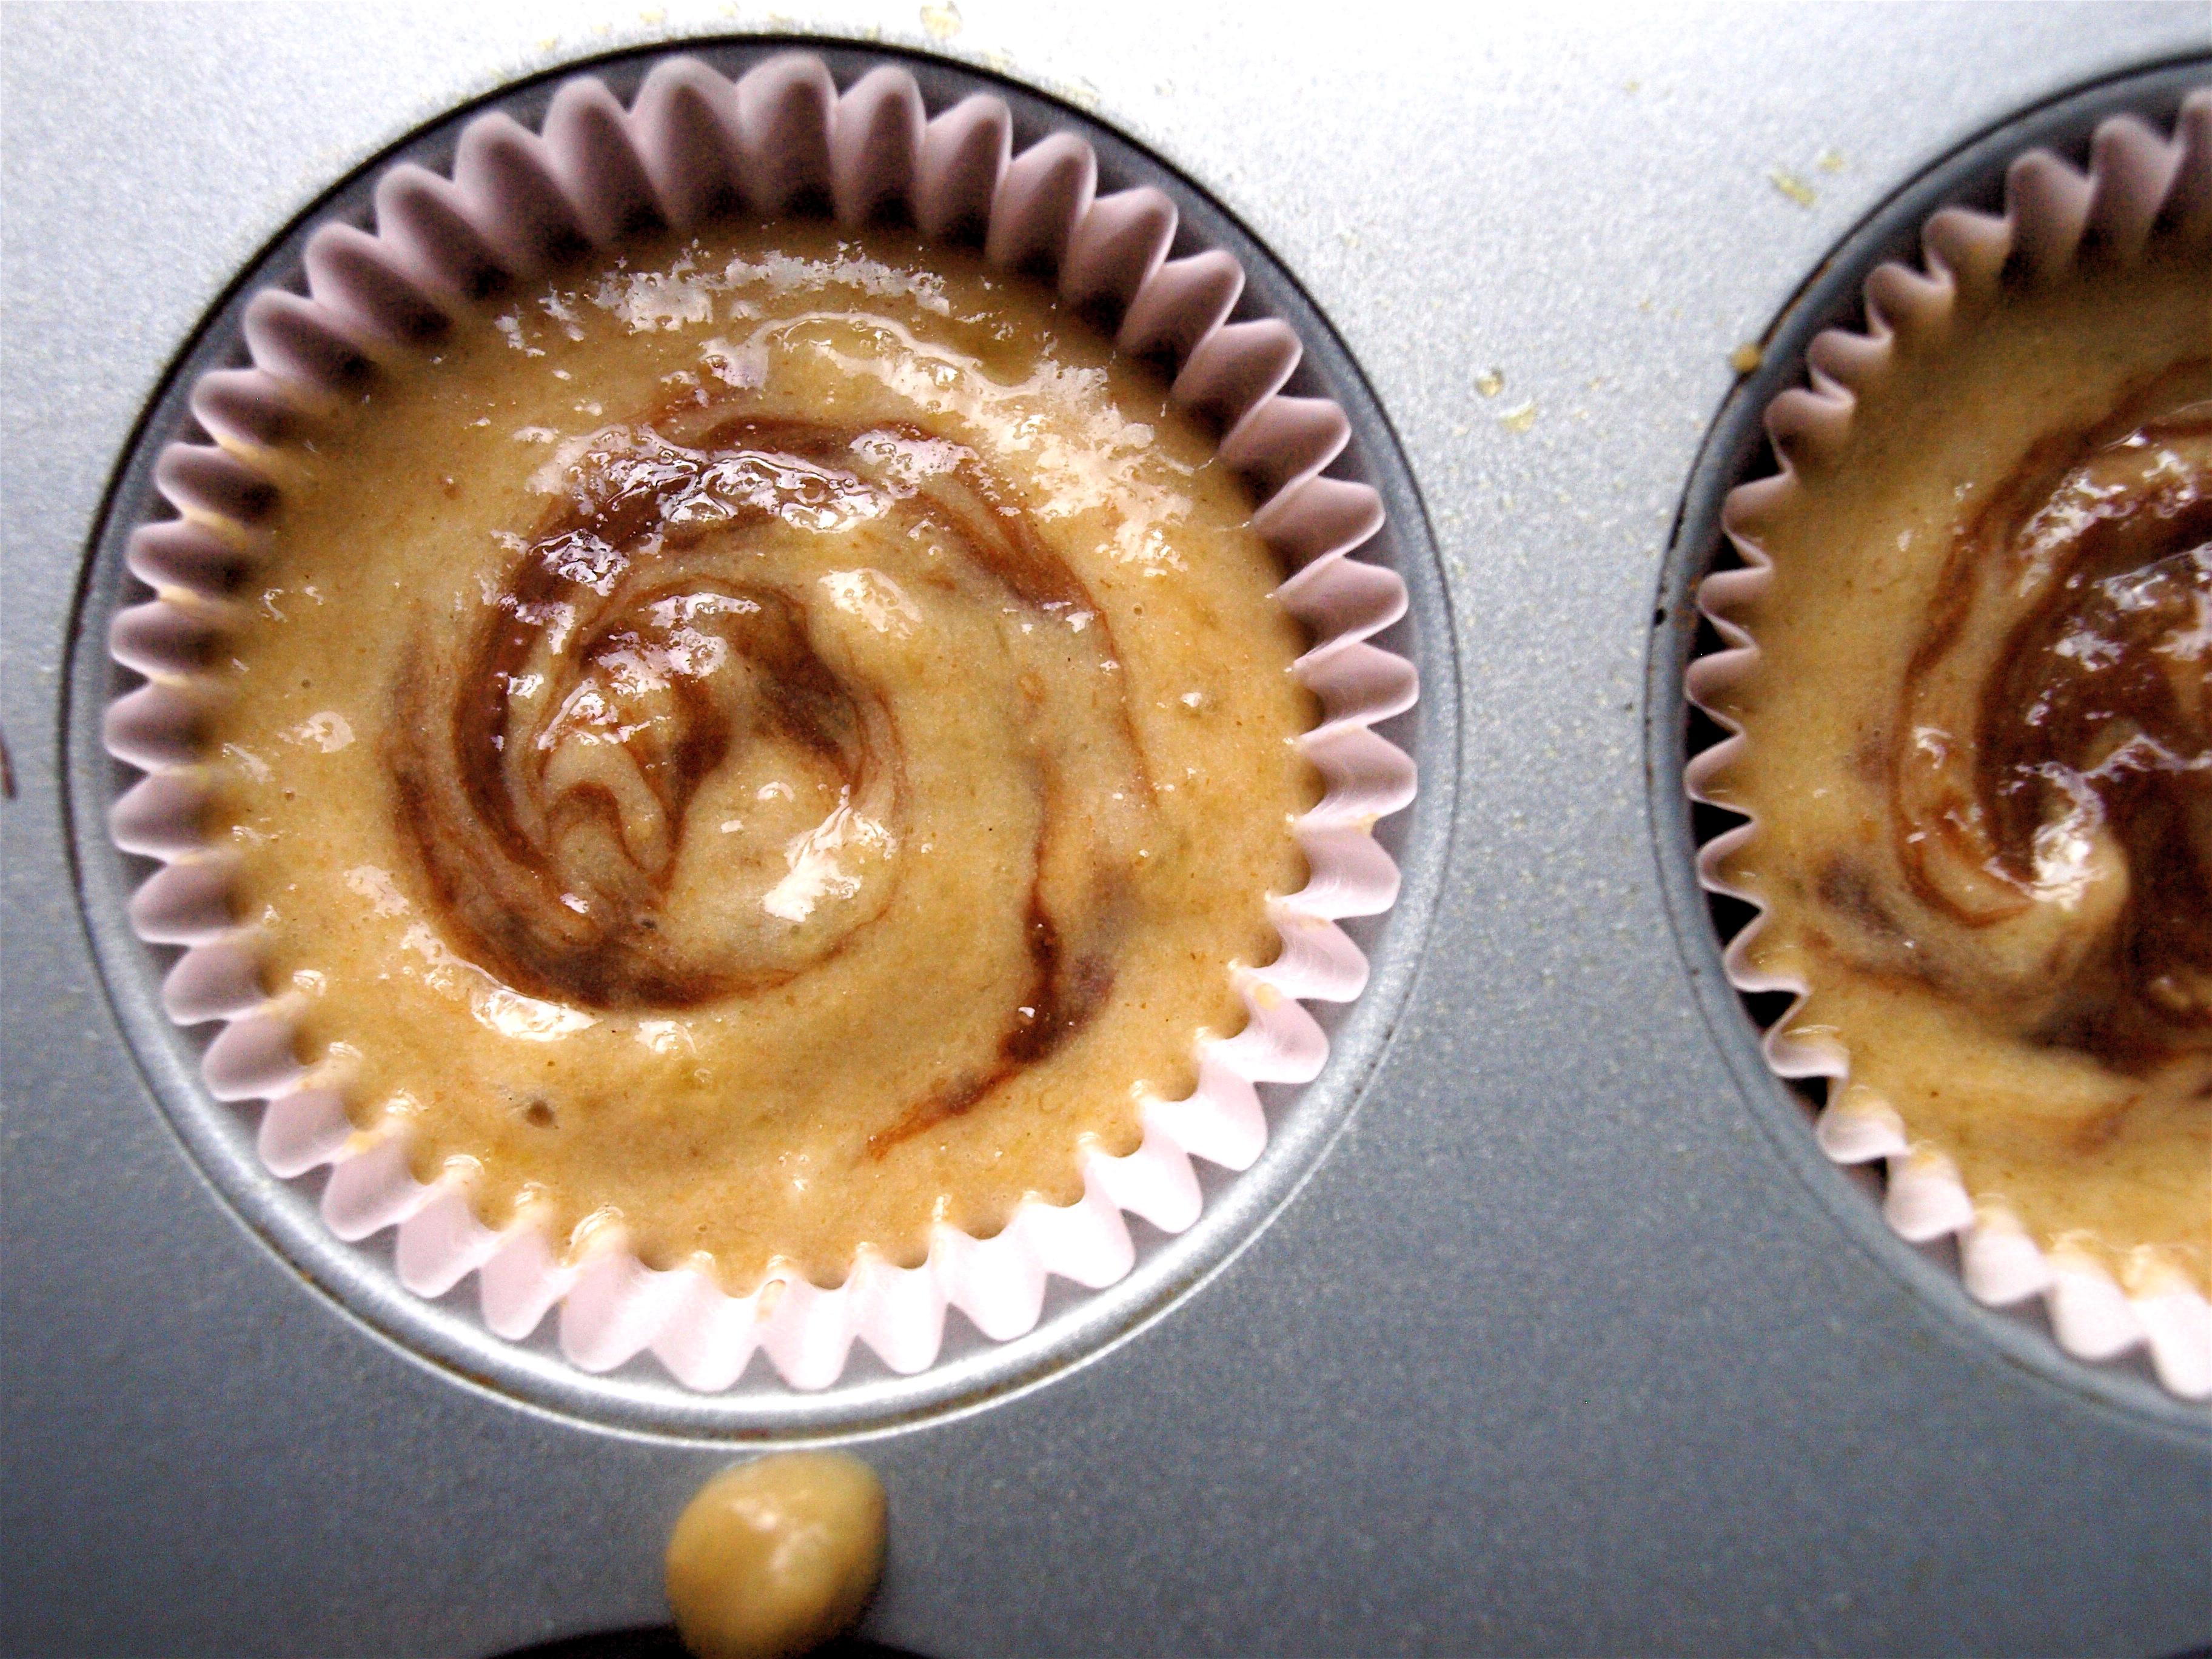 Banana nutella muffins pre-baking